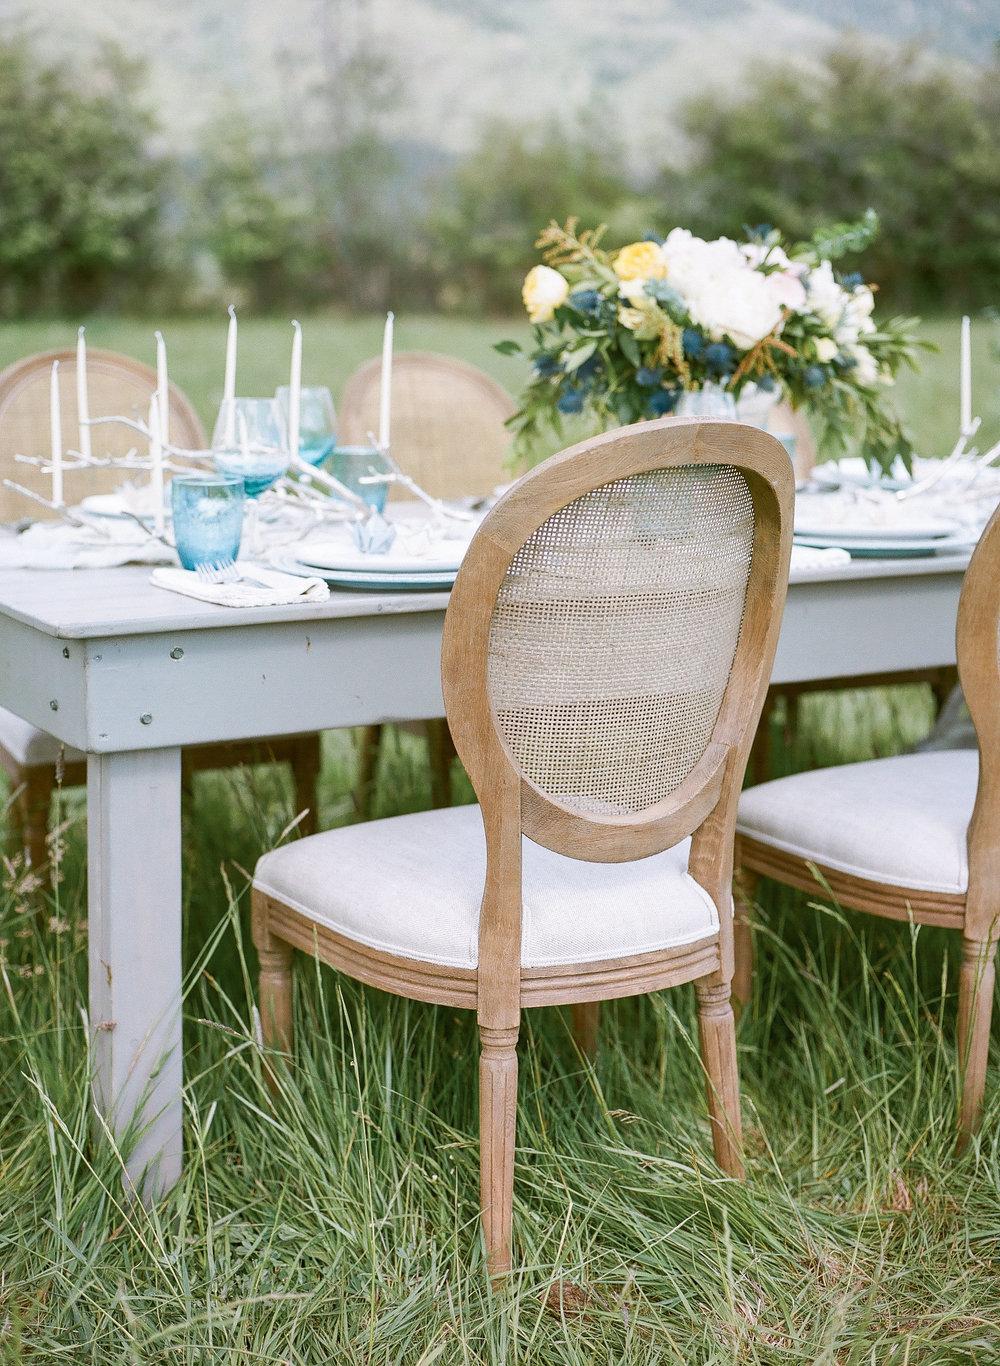 Twilight Moon Ranch Wedding Inspiration | Heather Nan Photography | Utah Wedding Planning and Design | Michelle Leo Events